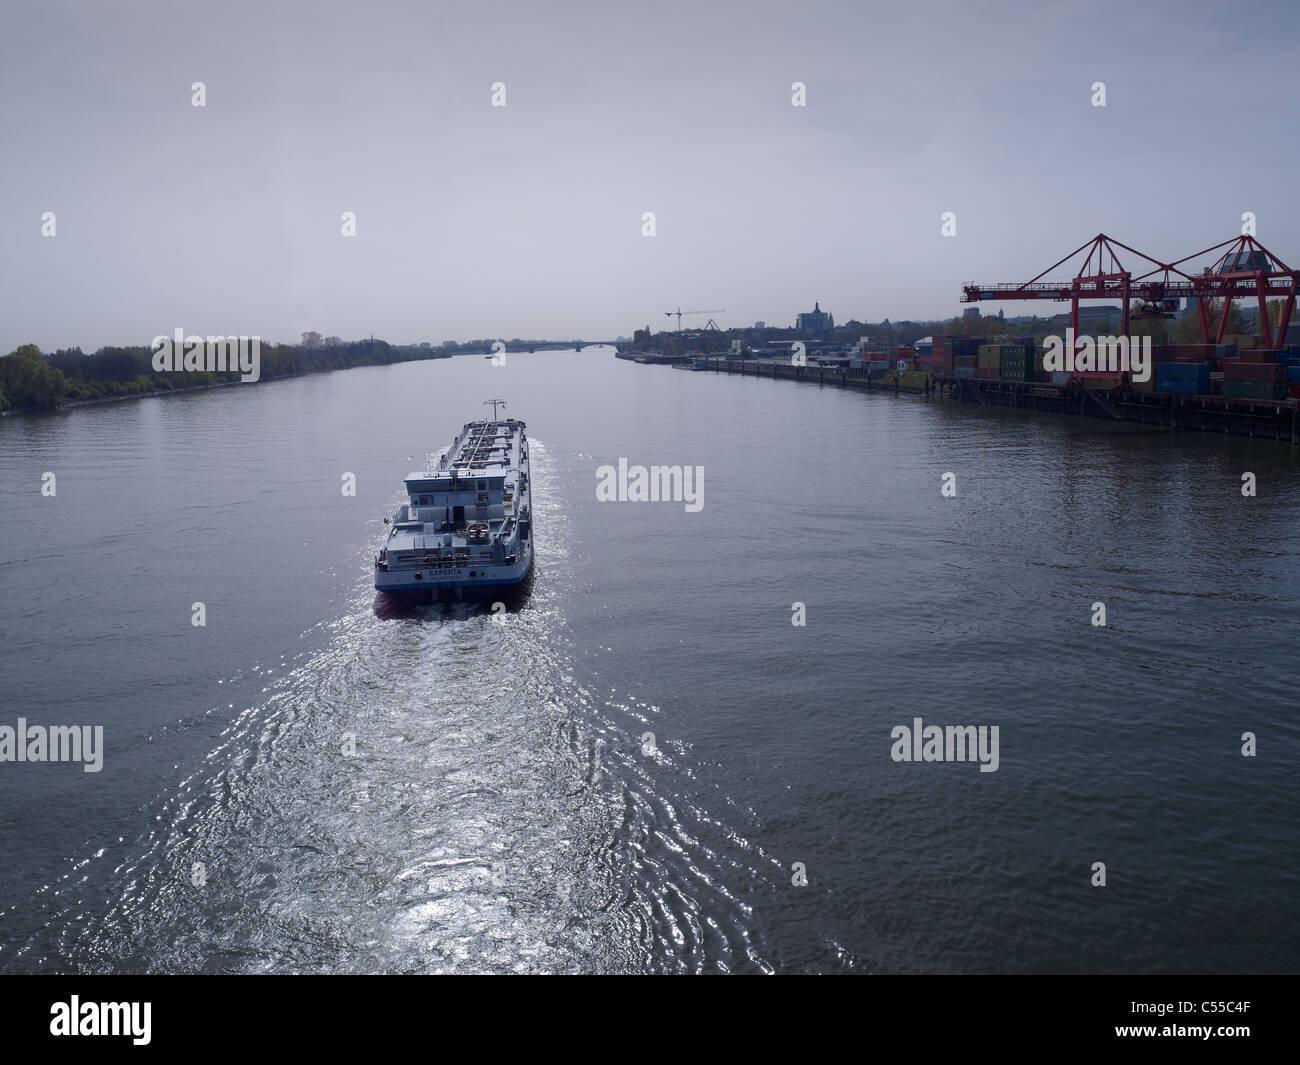 crude oil vessel on the Rhine near Mainz,Germany - Stock Image